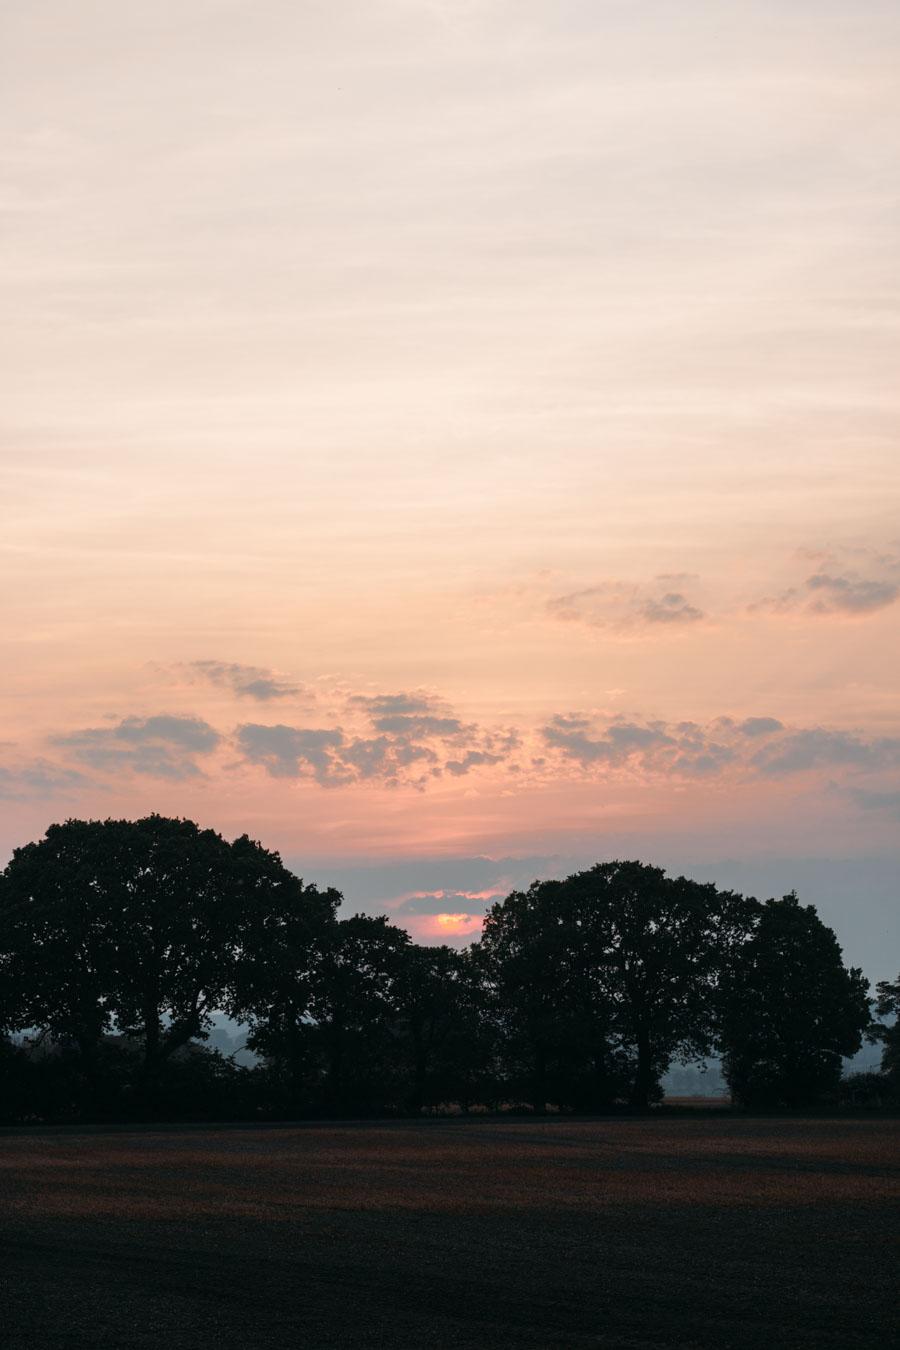 Rosy skyline